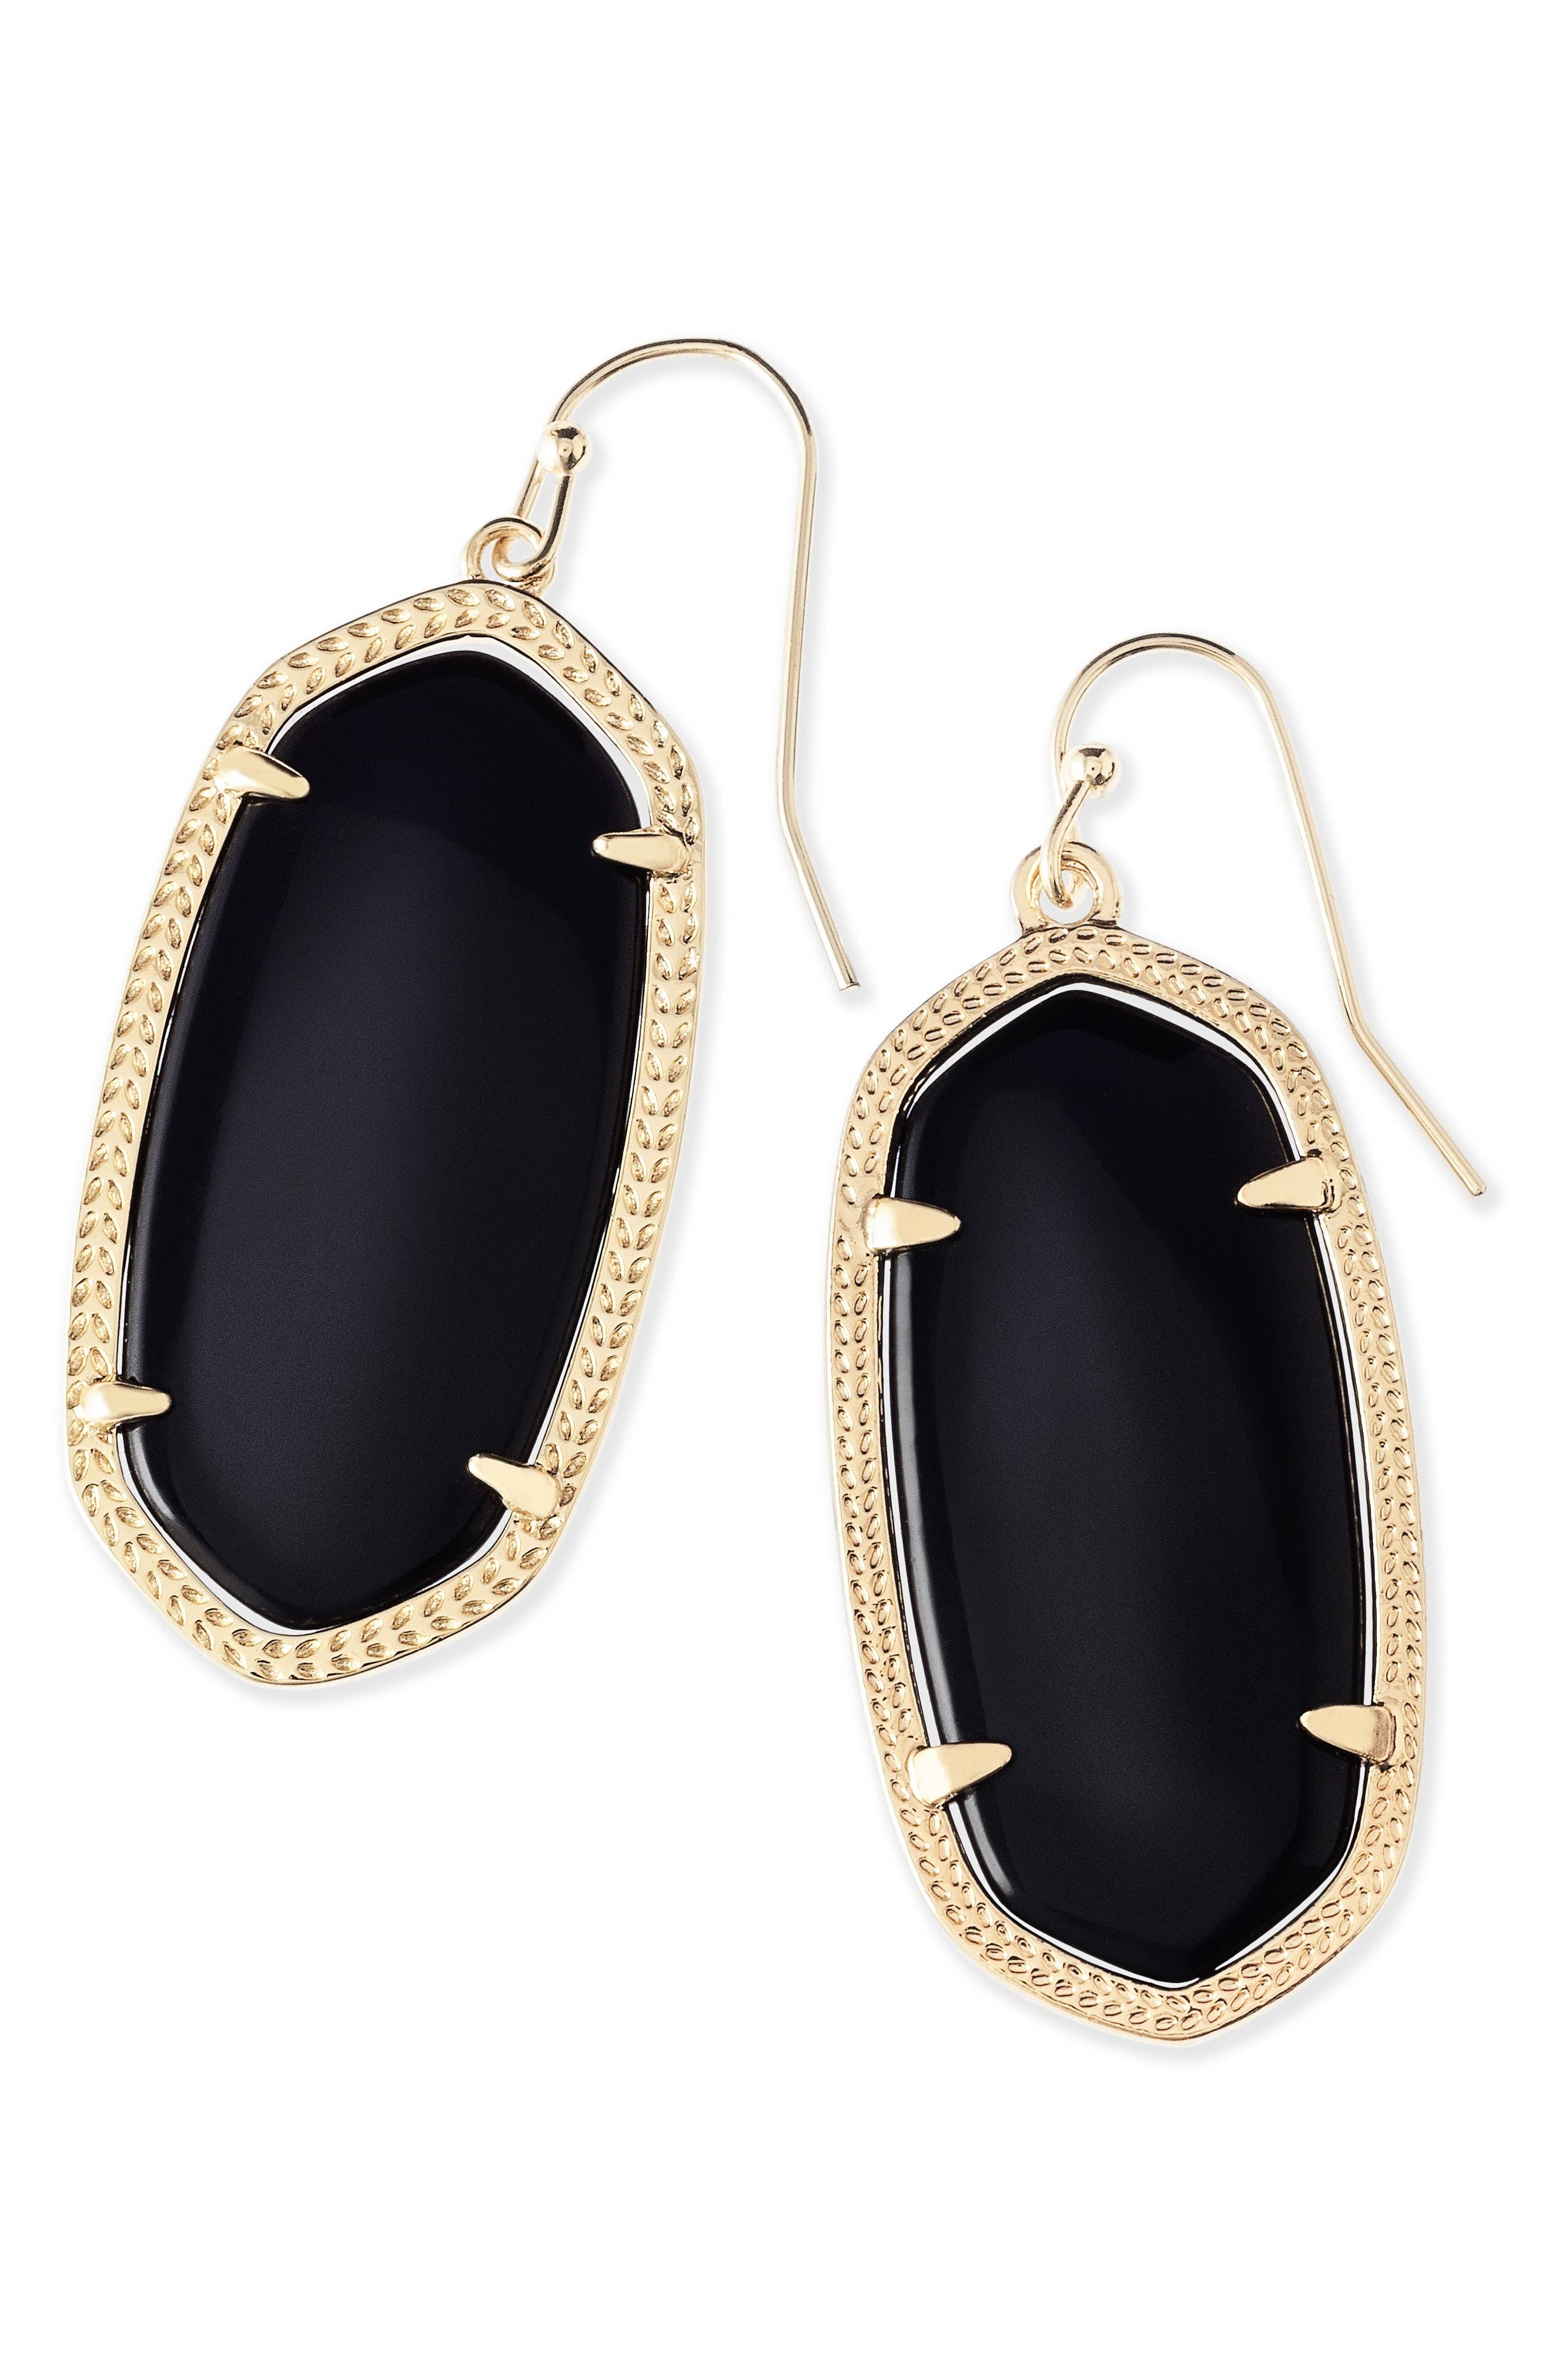 Elle Filigree Drop Earrings,                             Alternate thumbnail 5, color,                             BLACK/ GOLD